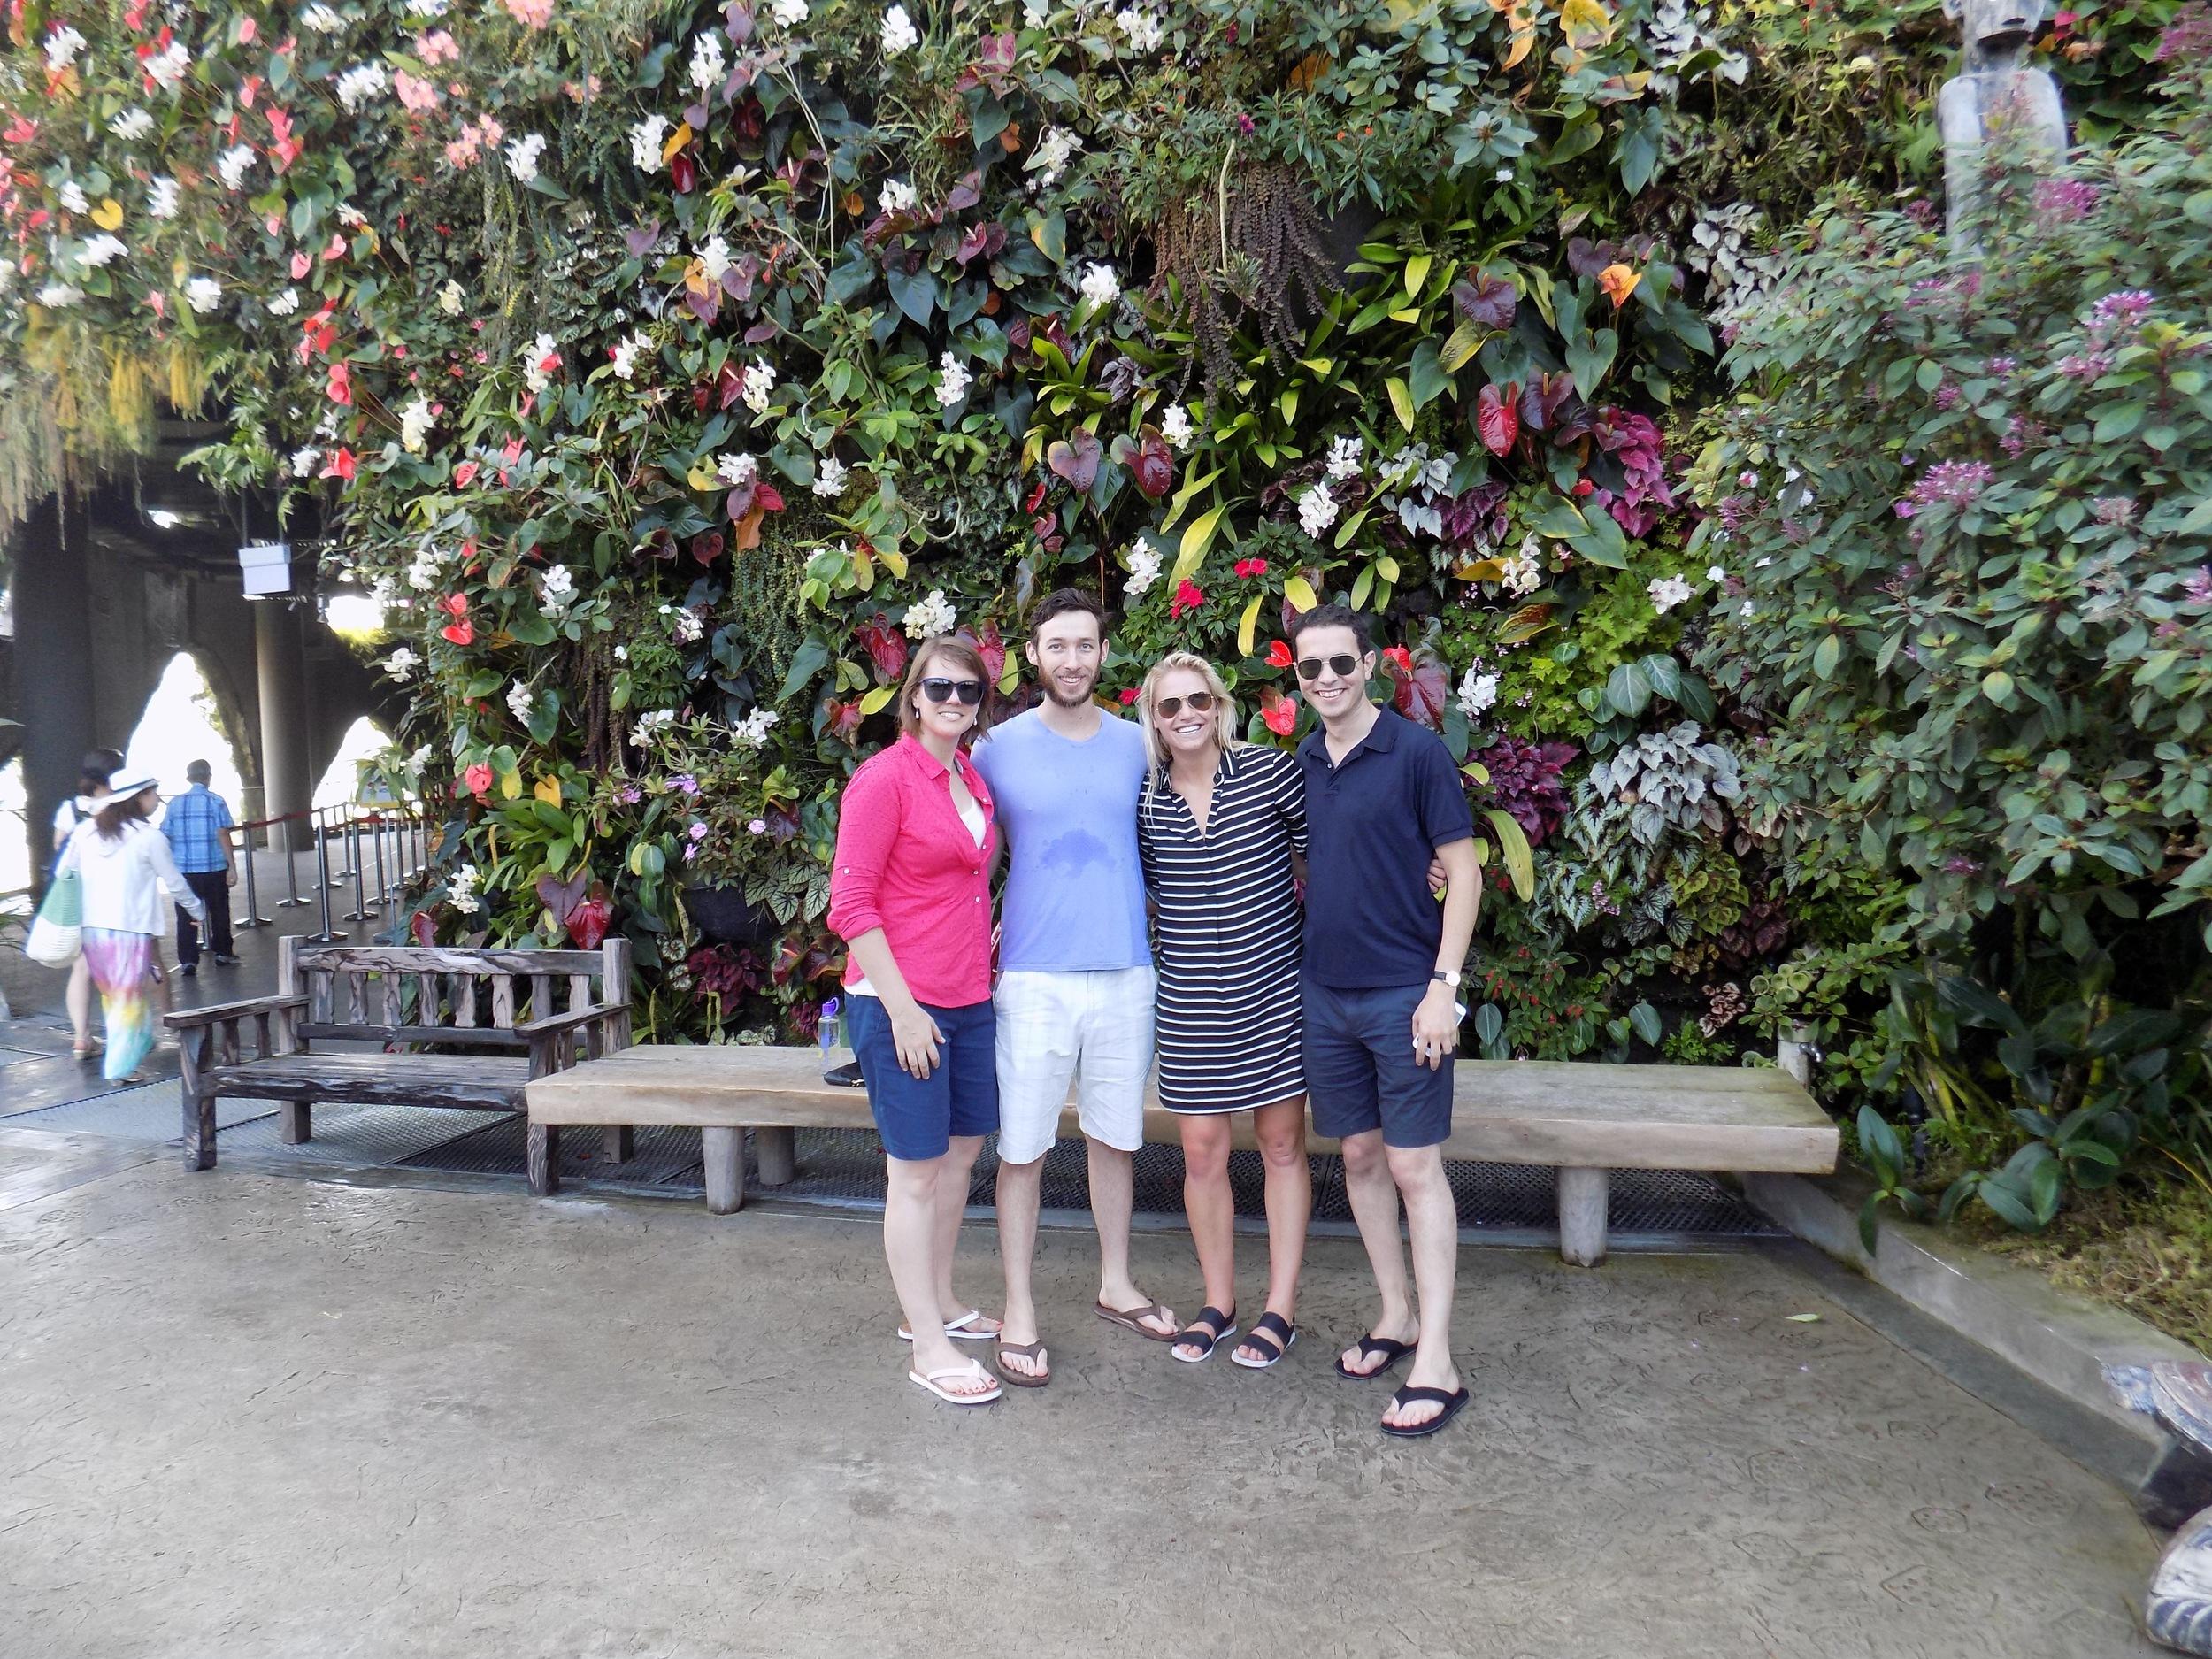 HGSE and Stanford crew - Rachel, Adam, Jaye, Martin